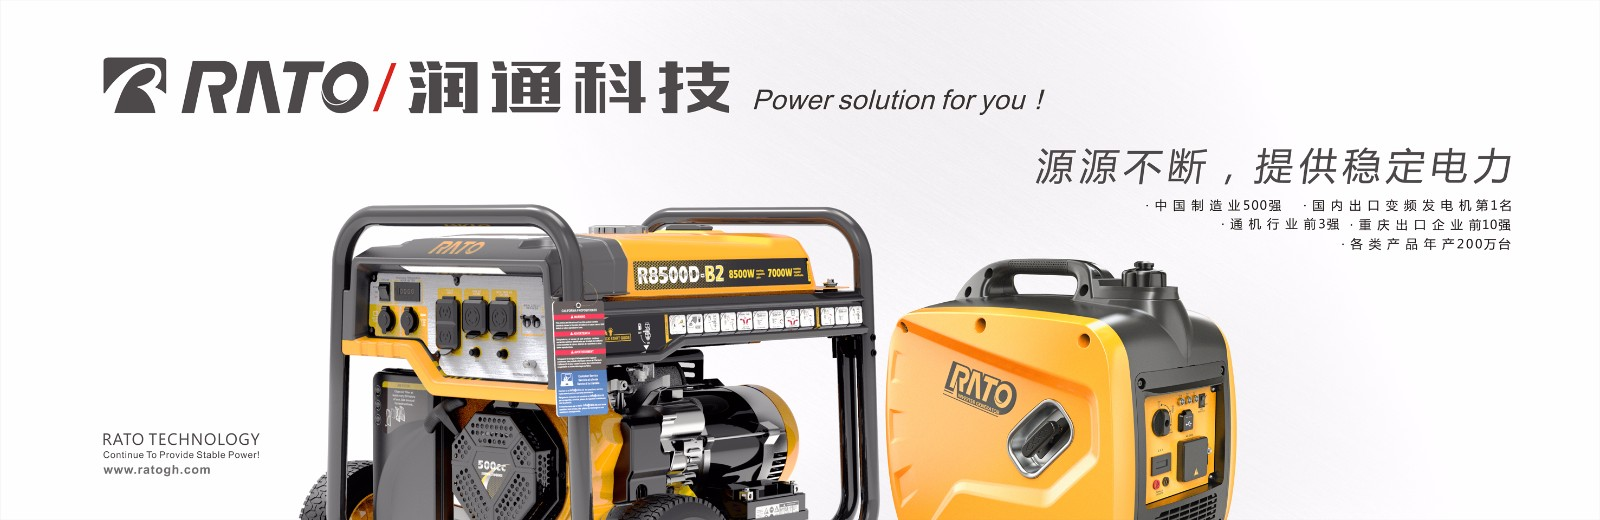 Chongqing Rato technology co., ltd